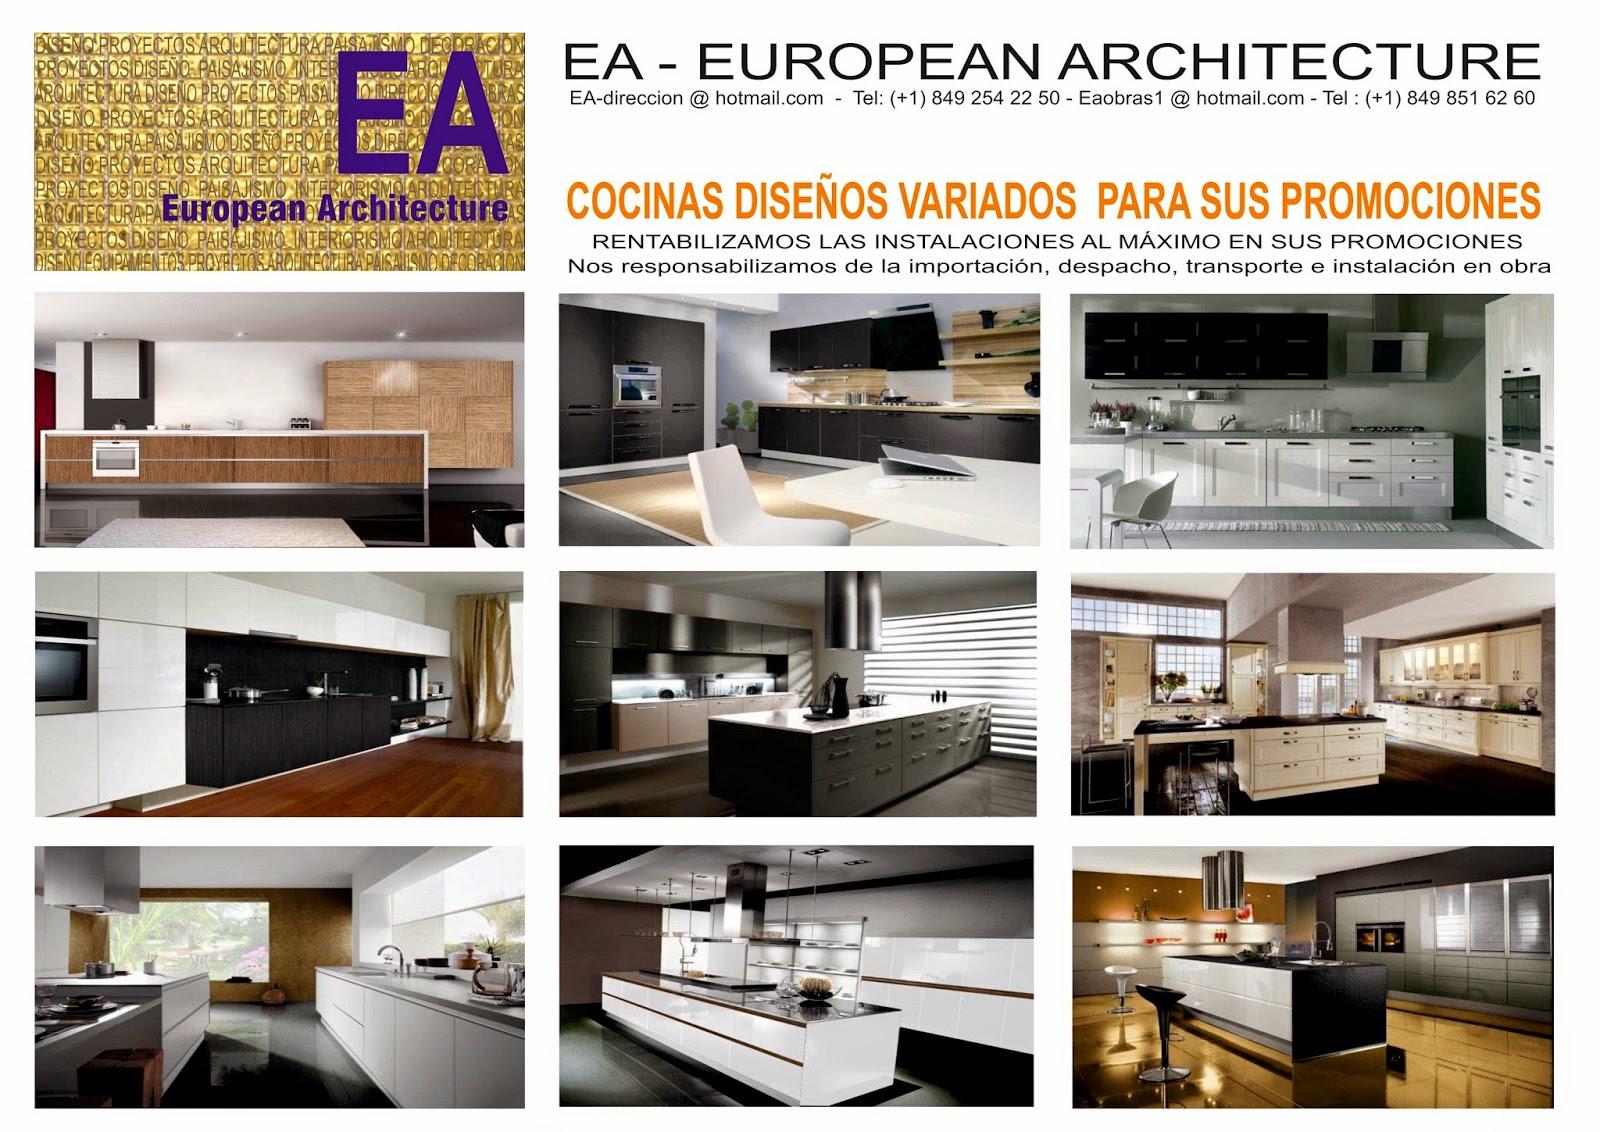 EA-EUROPEAN ARCHITECTURE: COCINAS